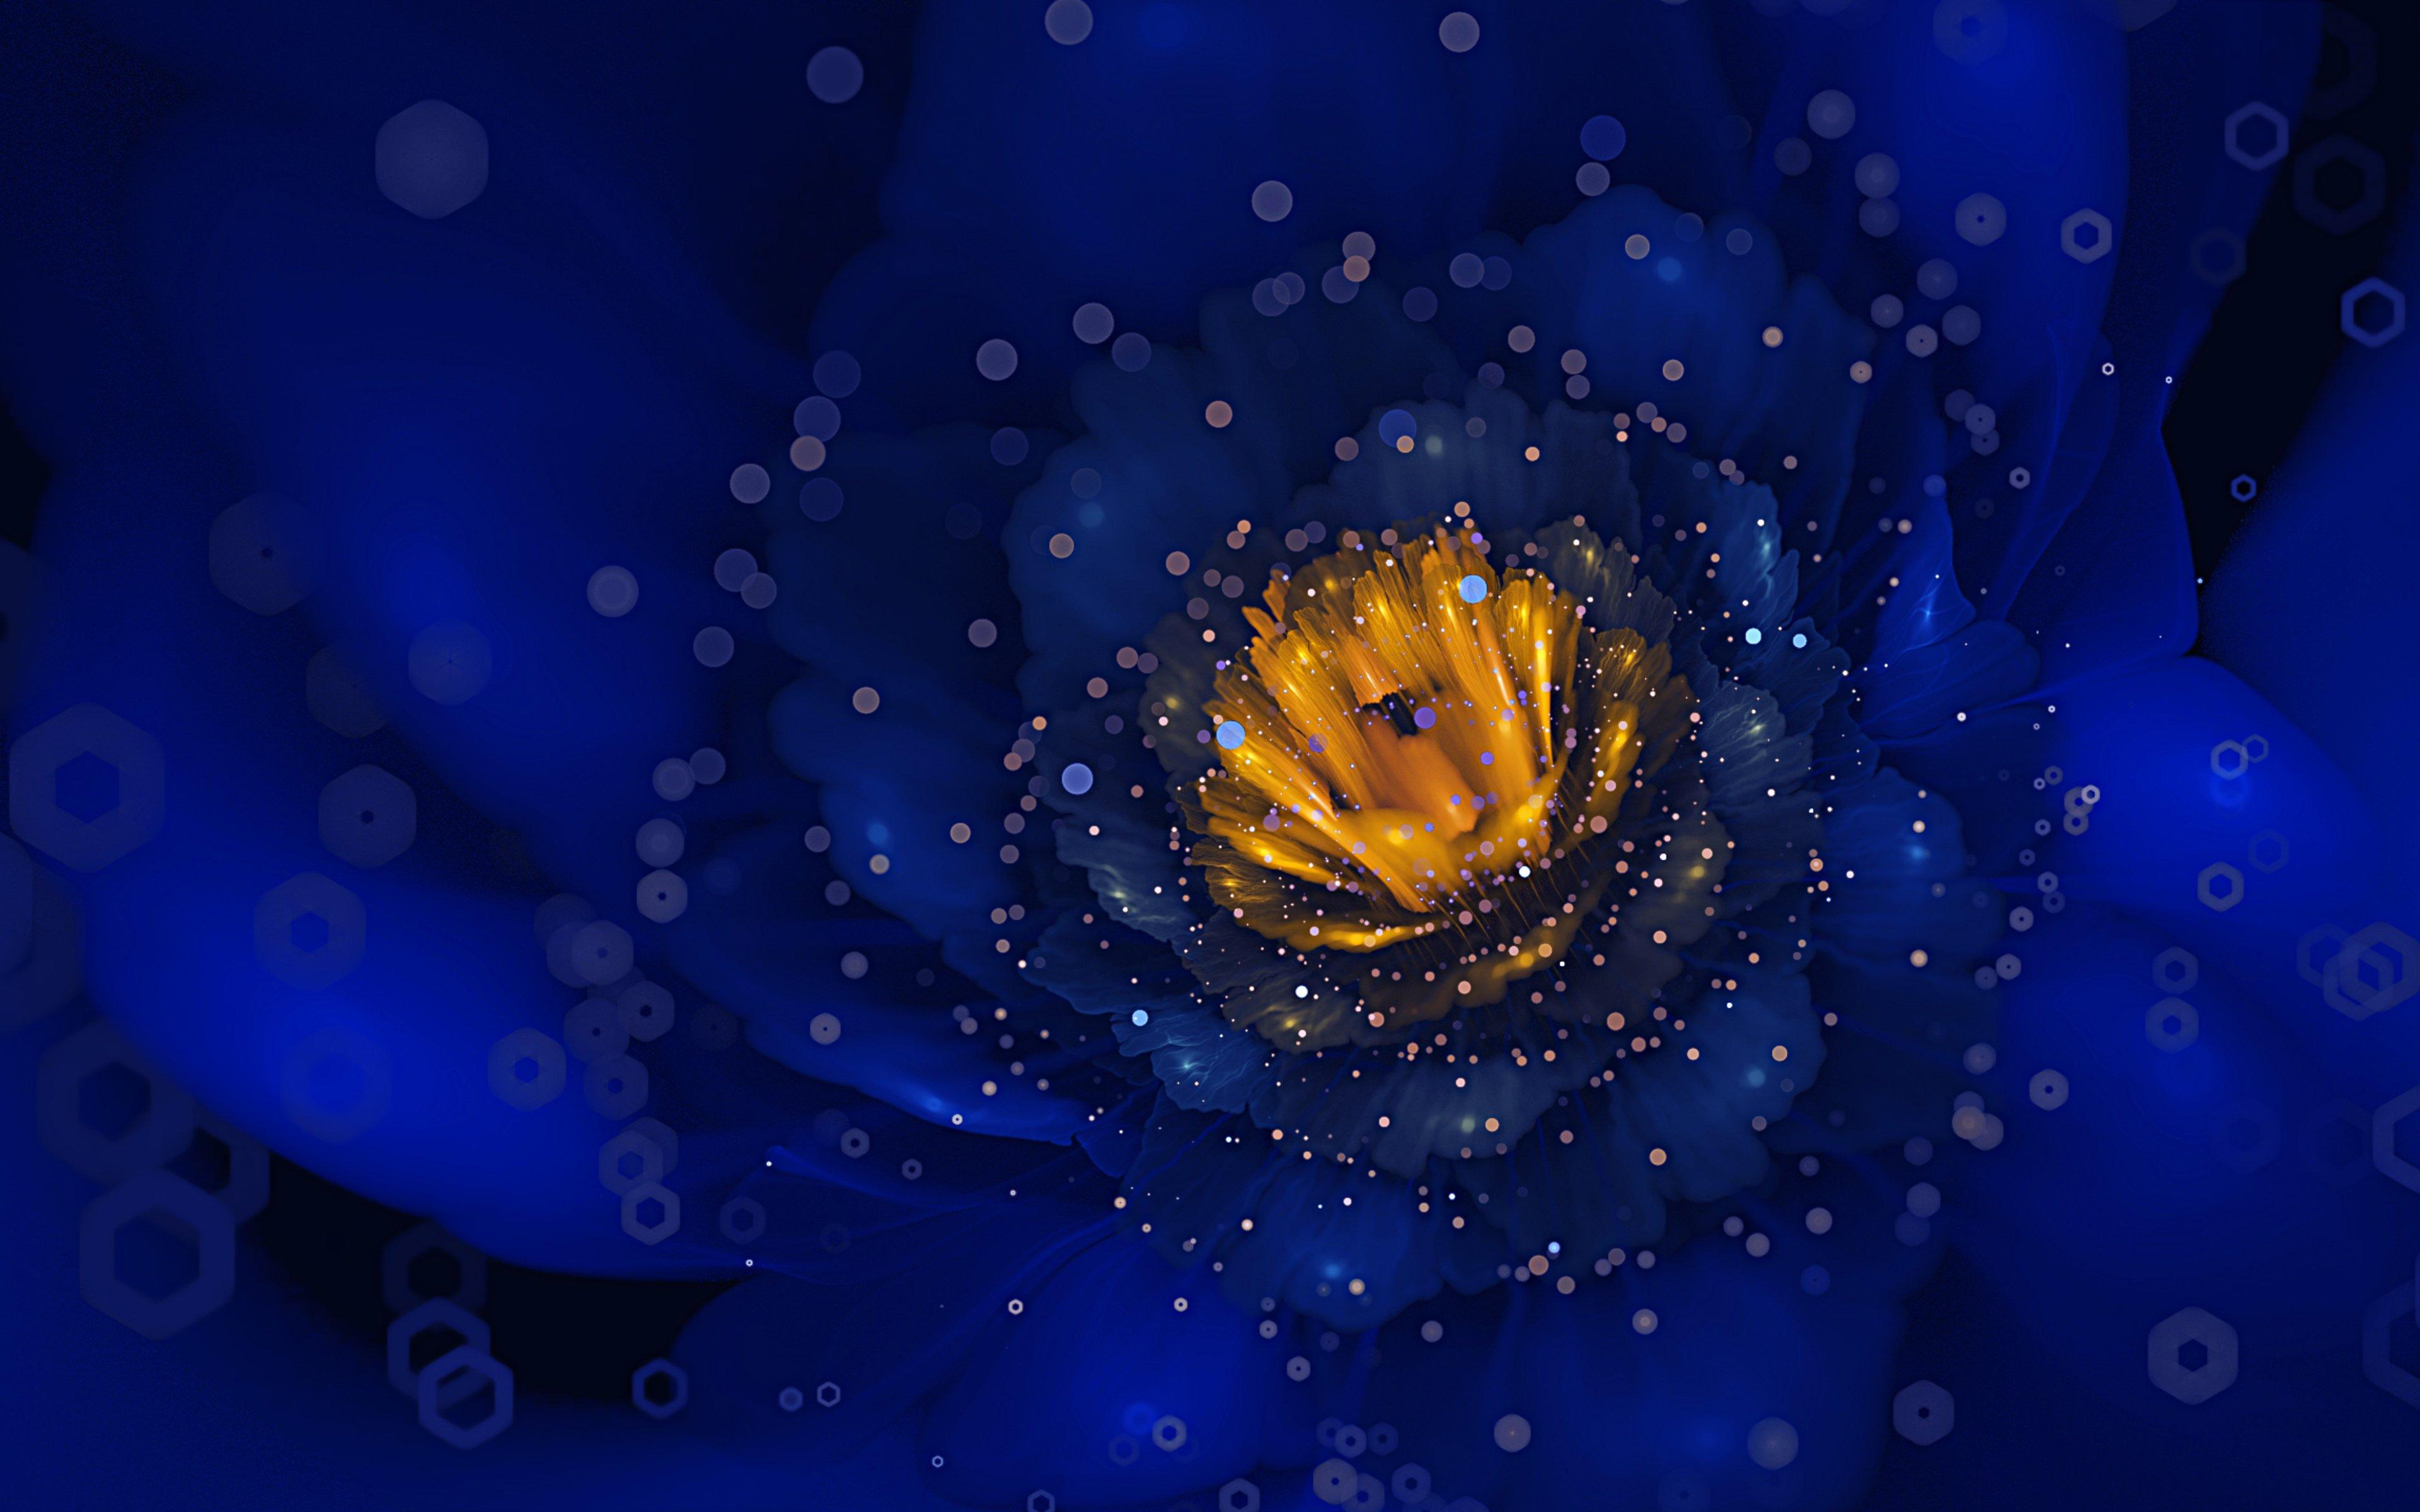 Fondos de pantalla Flor azul digital de cerca